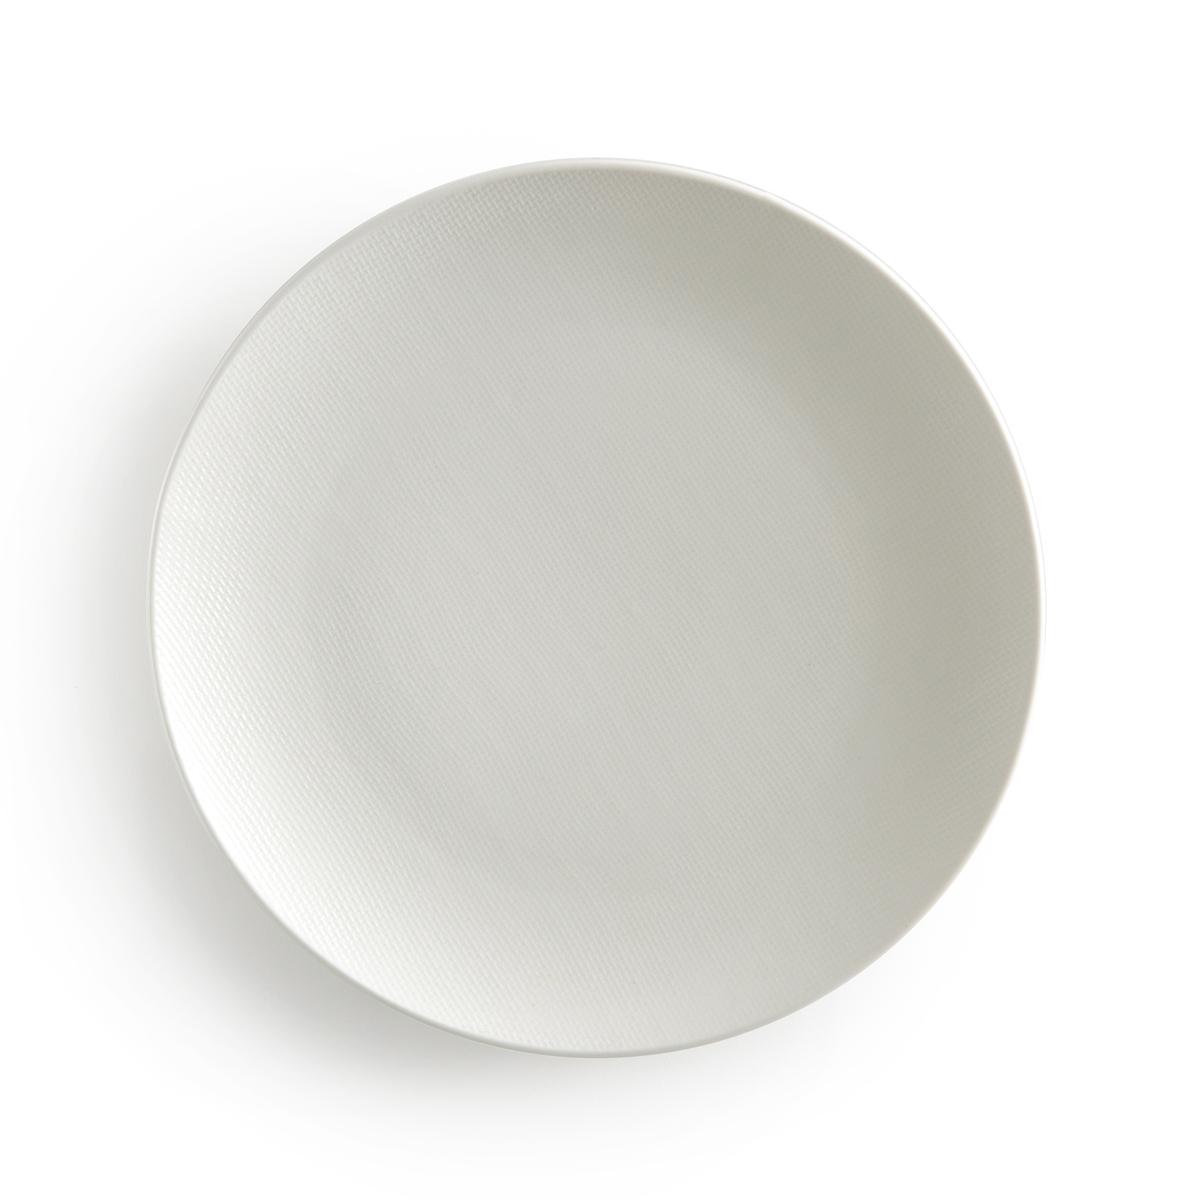 4 тарелки плоские из керамики, Lourette